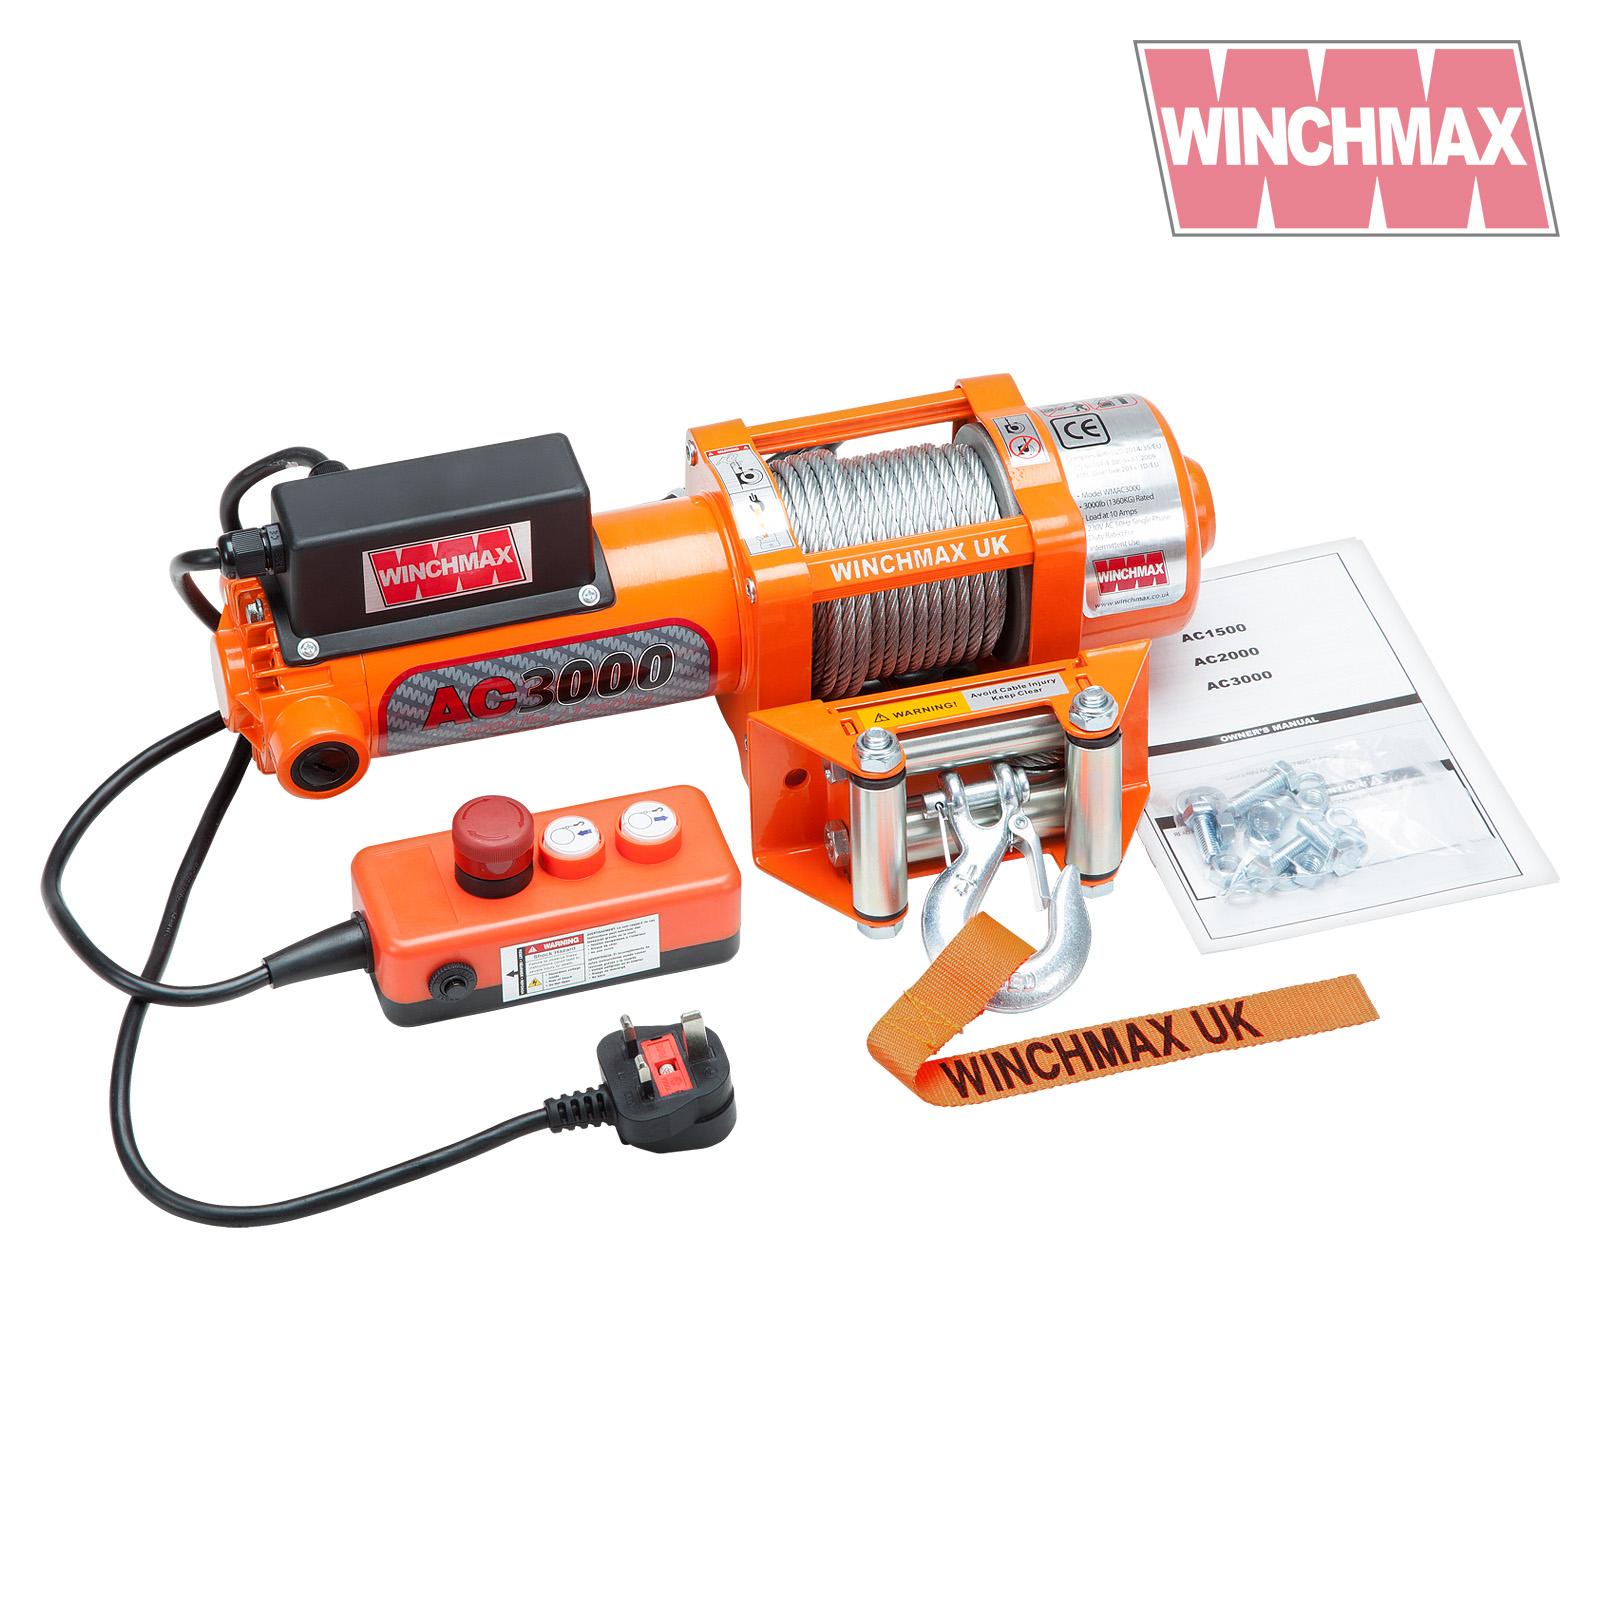 Wmac3000 winchmax 216